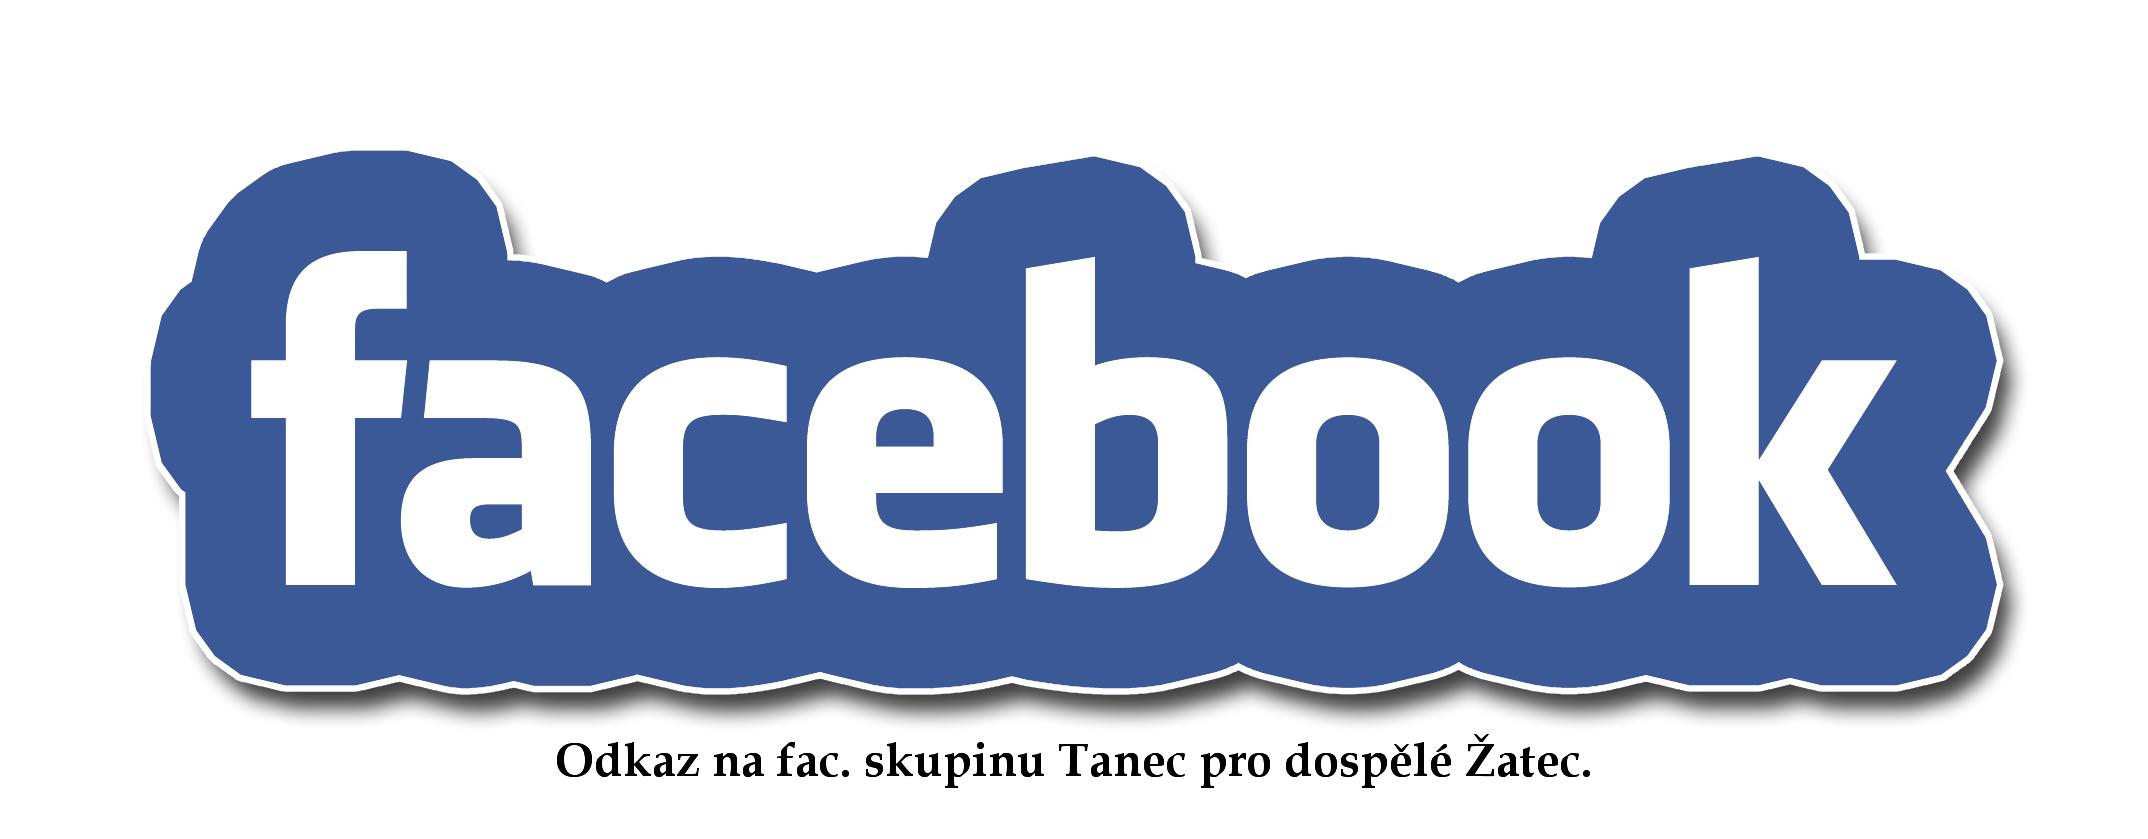 facebook_odkaz_tanec_pro_dosp__l__